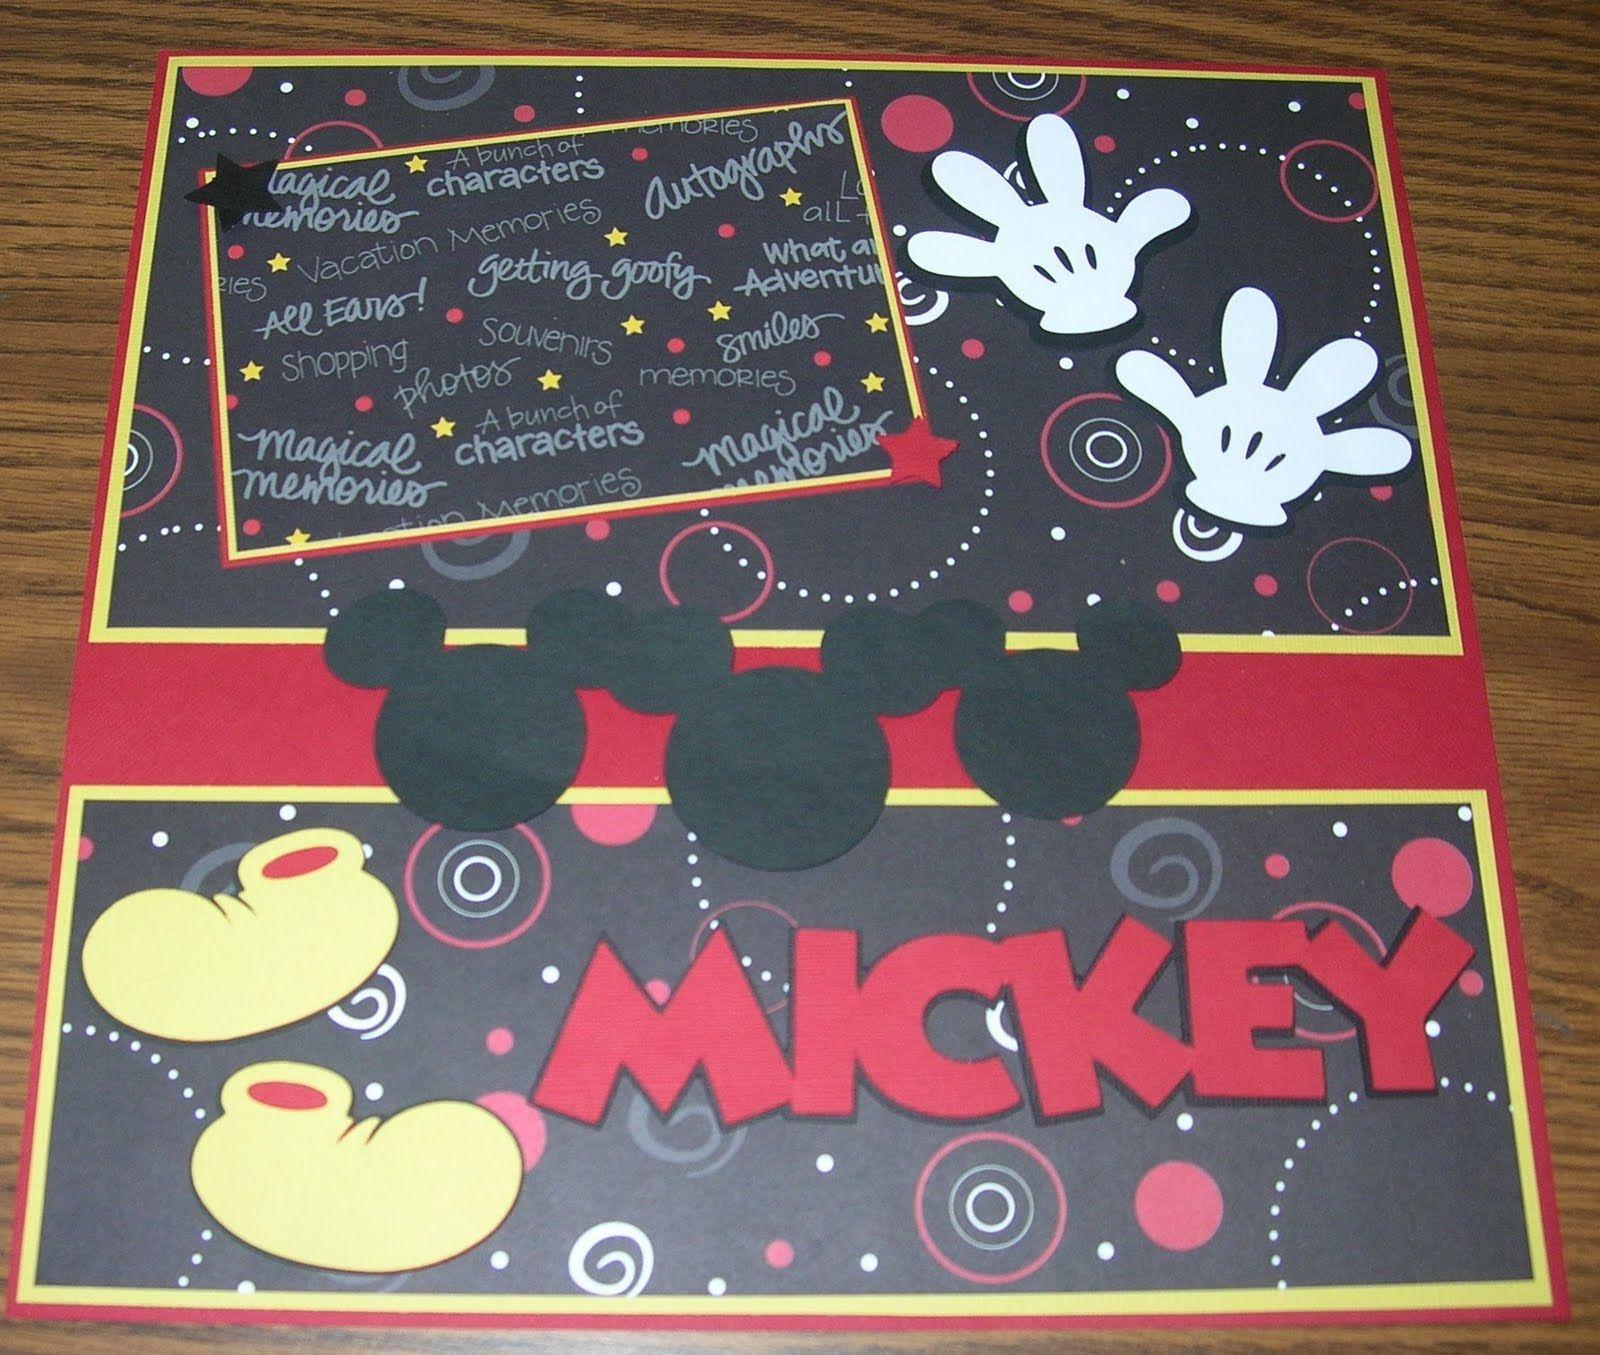 Scrapbook ideas using cricut - Disney Scrapbook Layouts Labels 12x12 Layouts Cricut Disney Hello Kitty